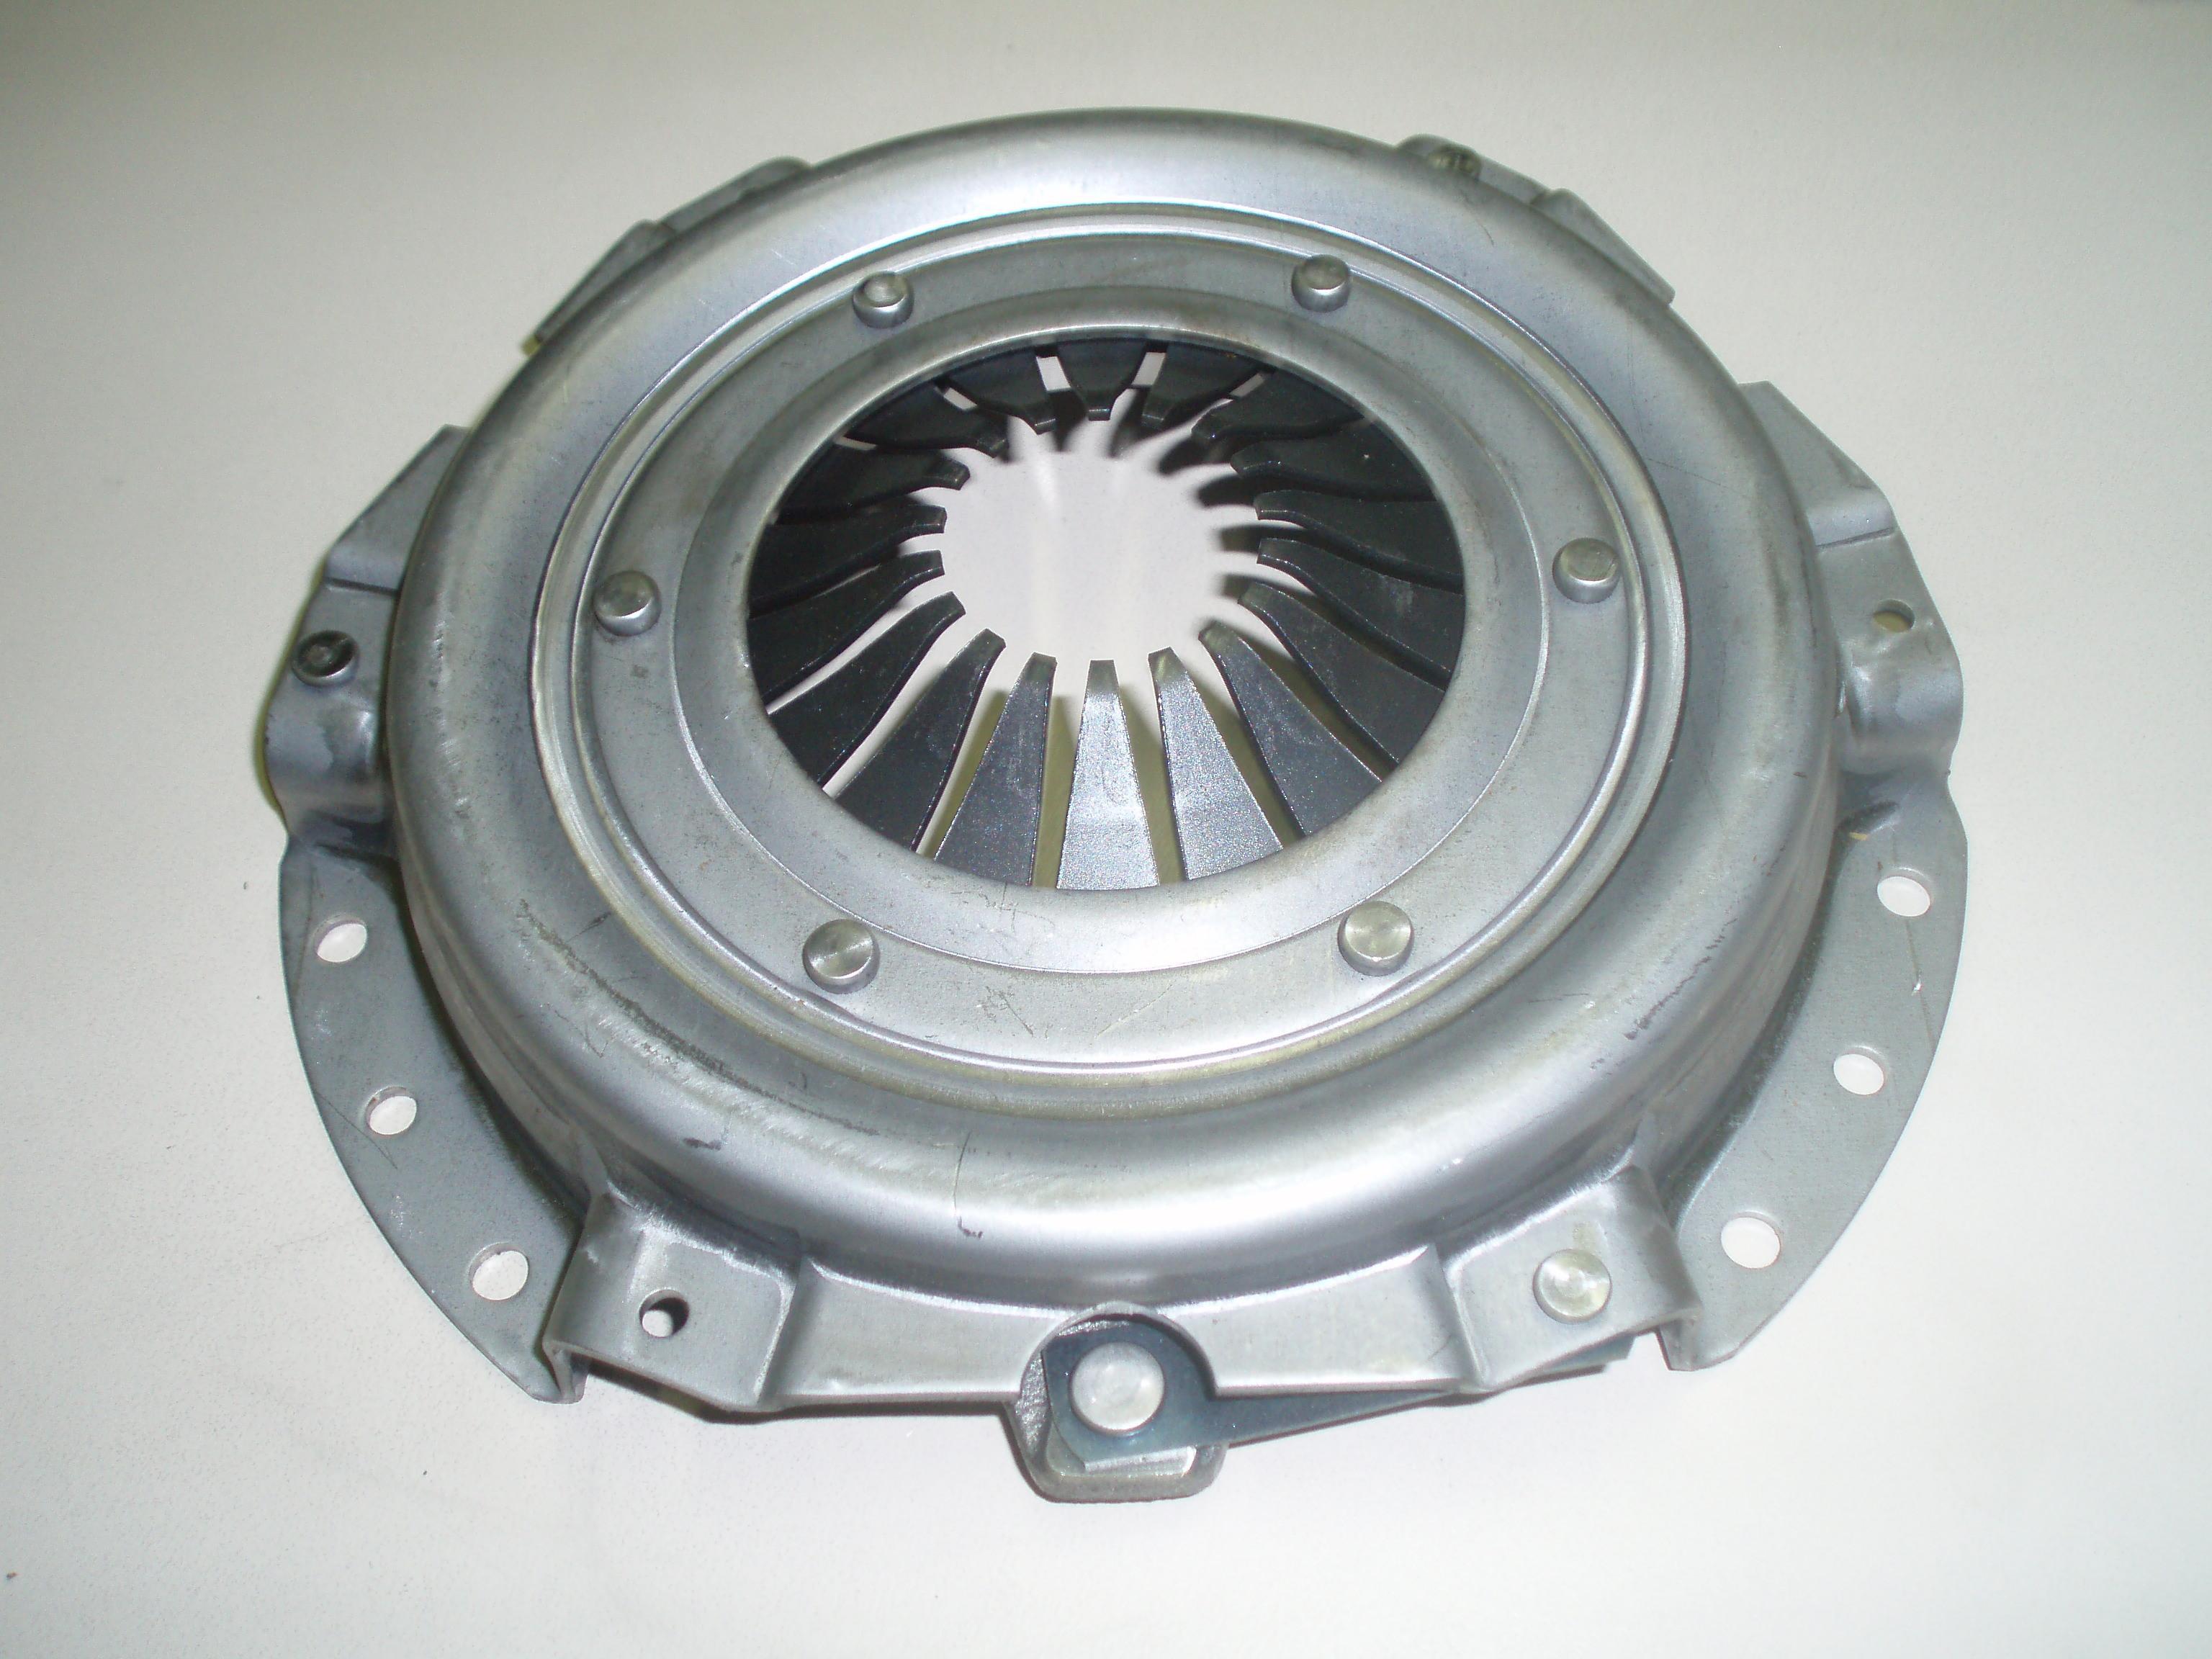 Mecanisme embrayage 3LD450 3LD510 LA400 LA490 LOMBARDINI INTERMOTOR 5499001 / CERMAG 15381